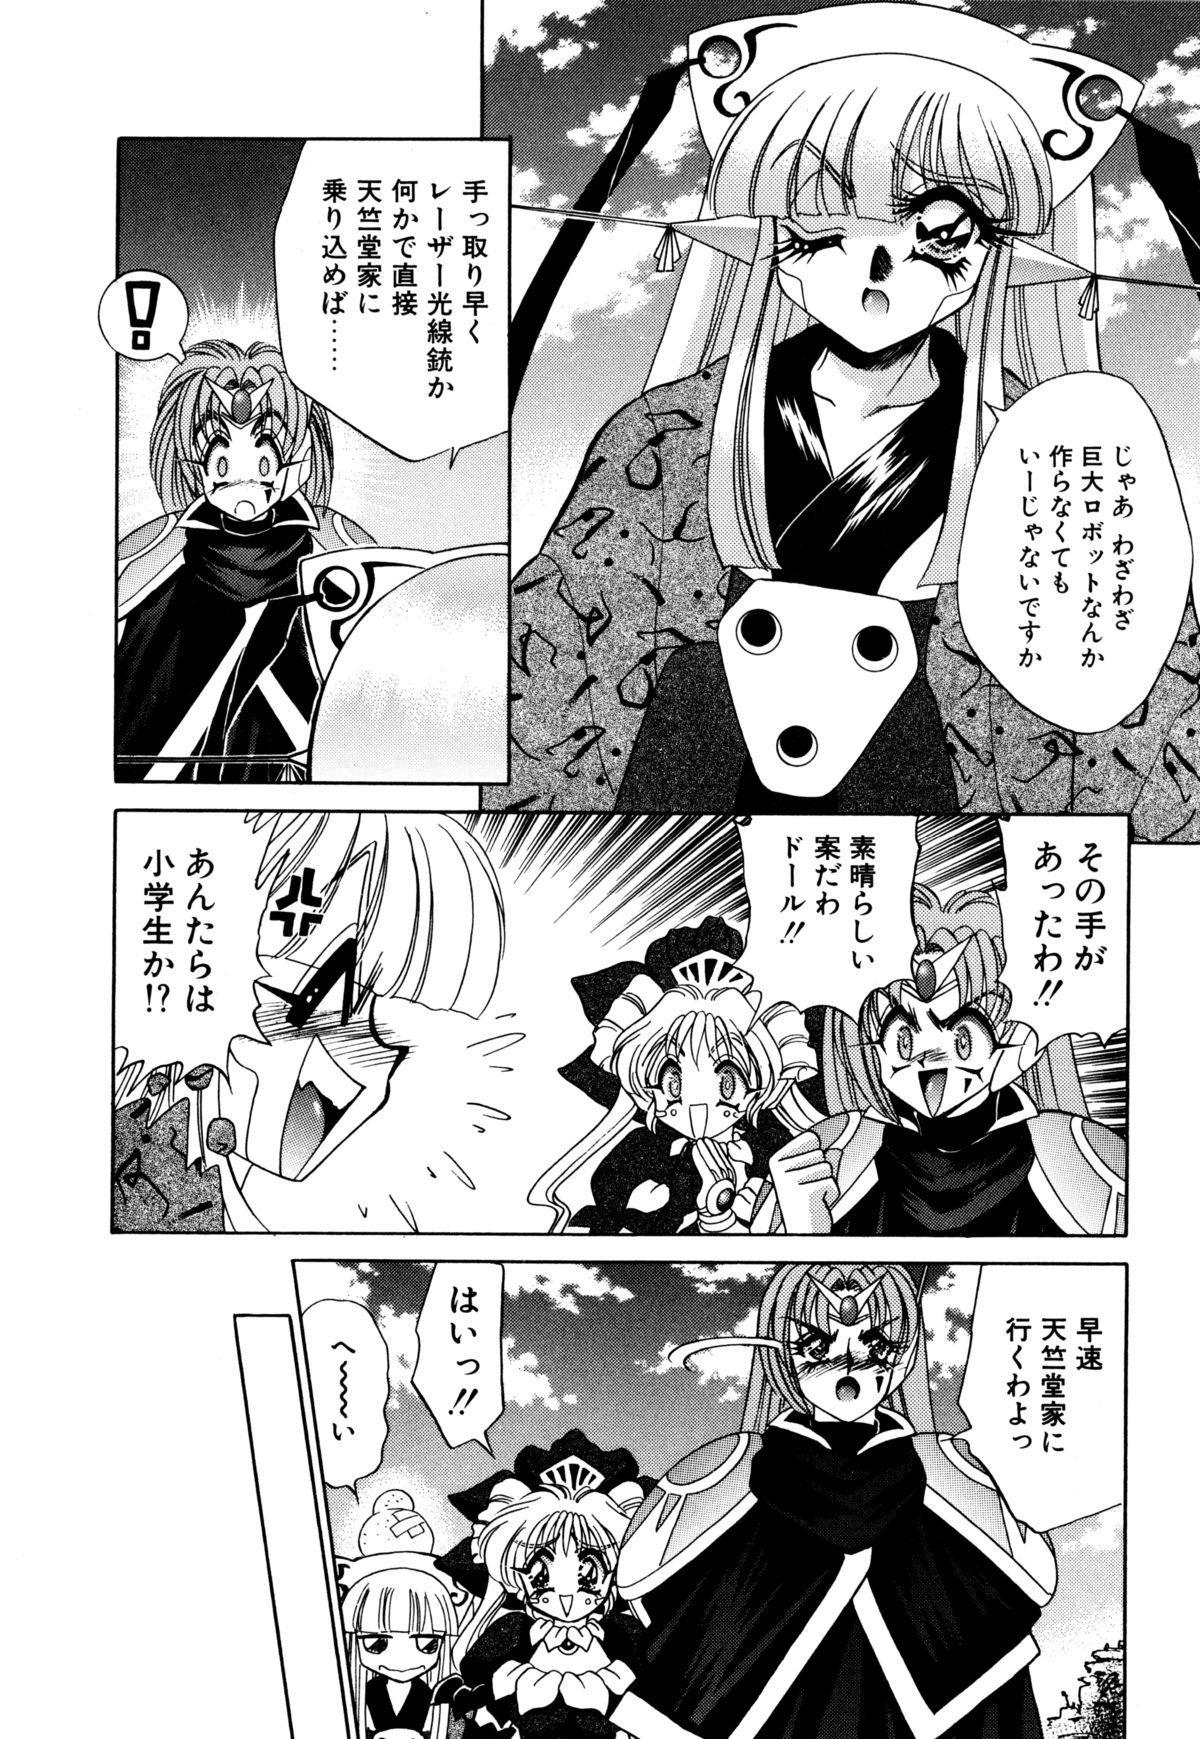 Kigurumi Sentai Quiltian 140